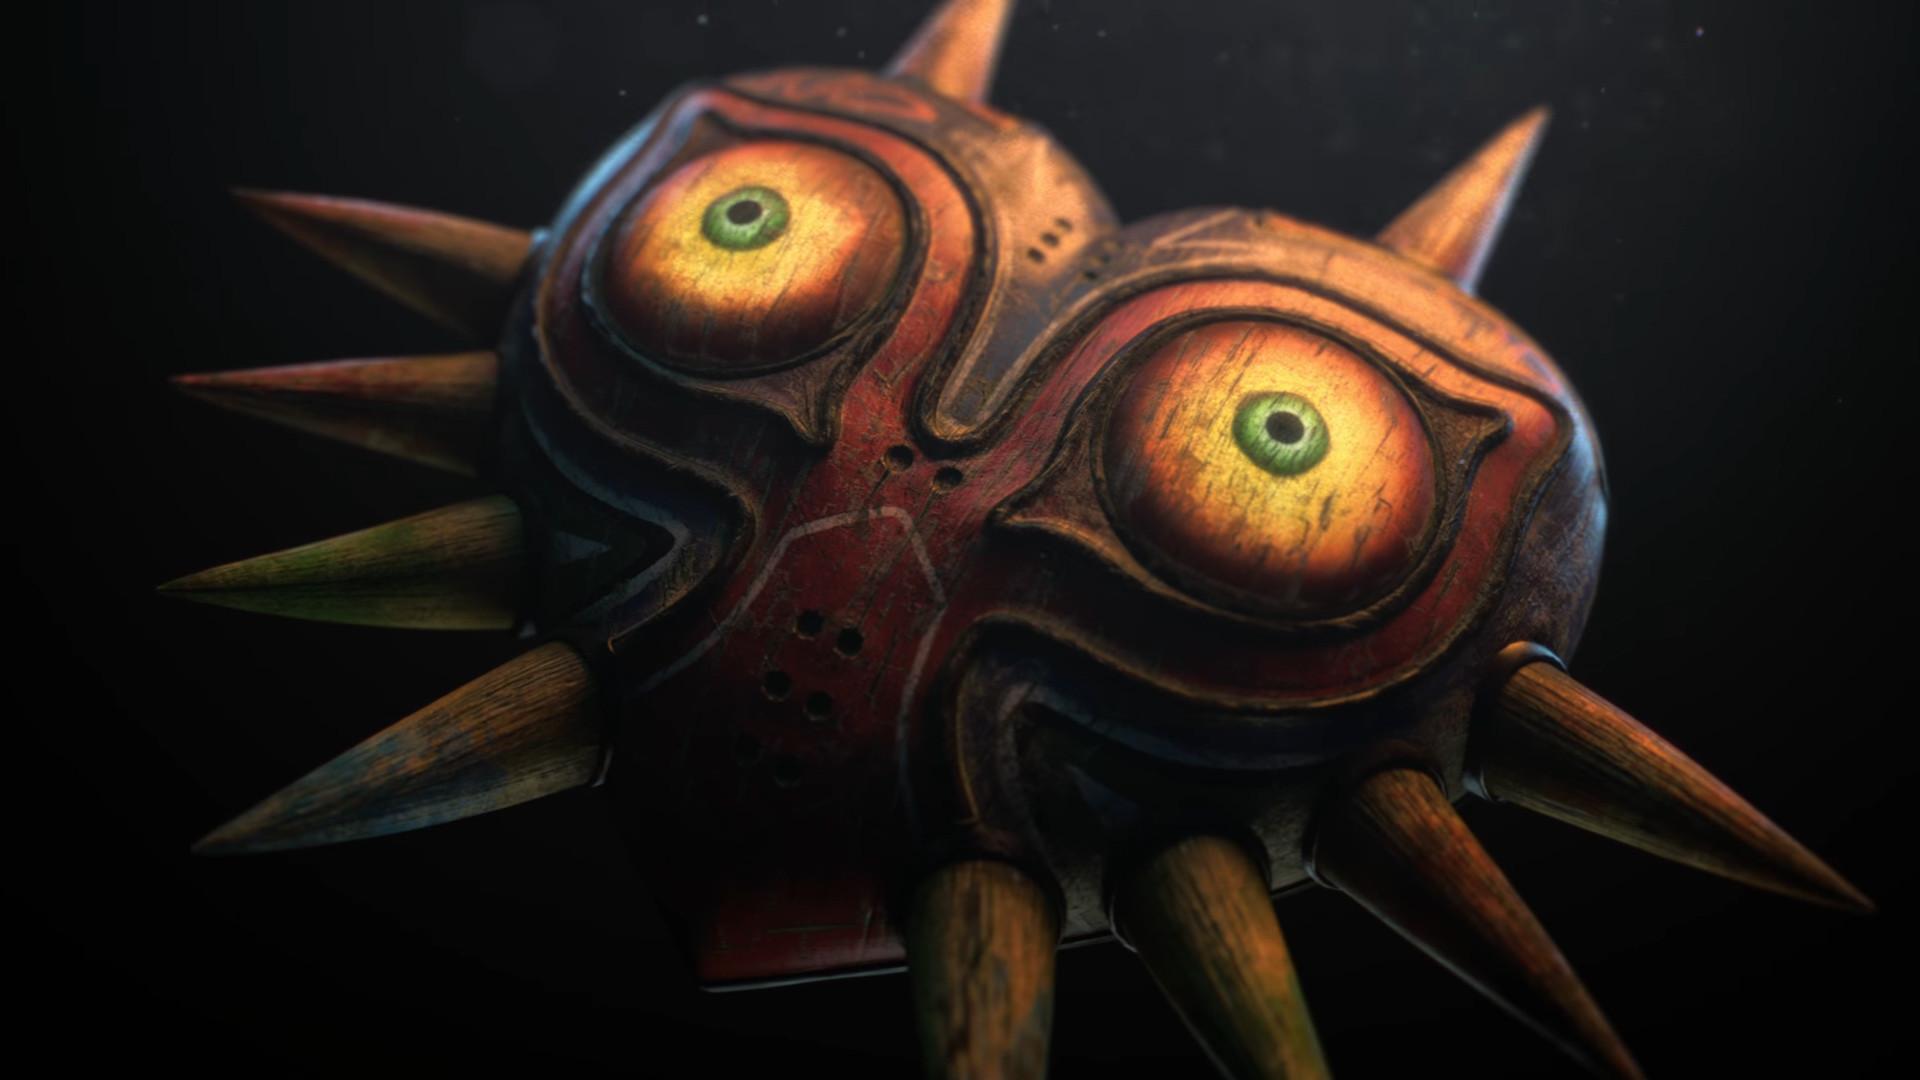 Majora's Mask – Terrible Fate